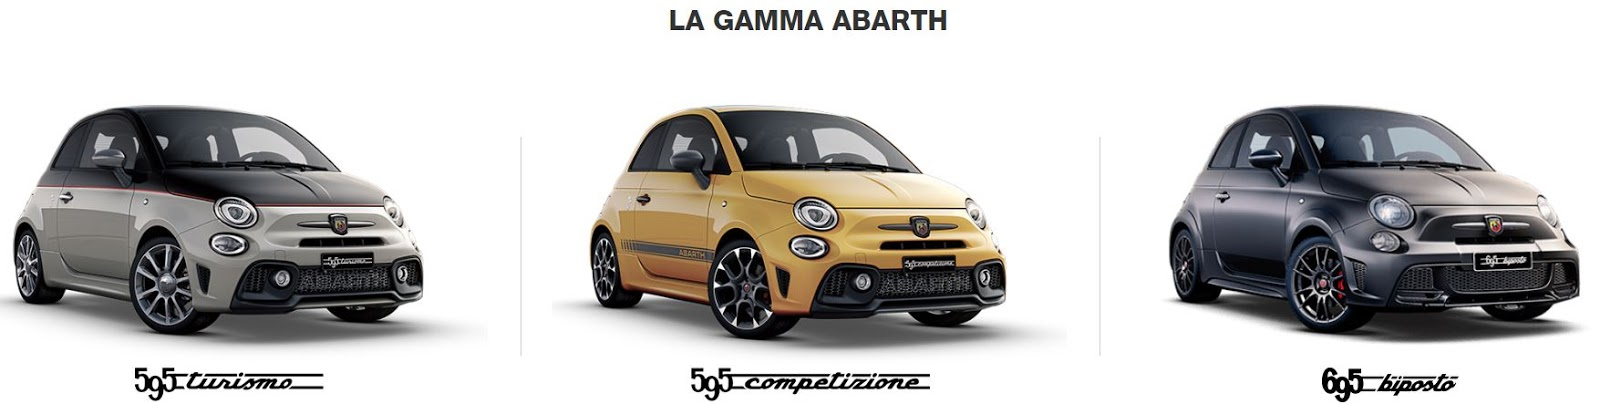 gamma abarth 595